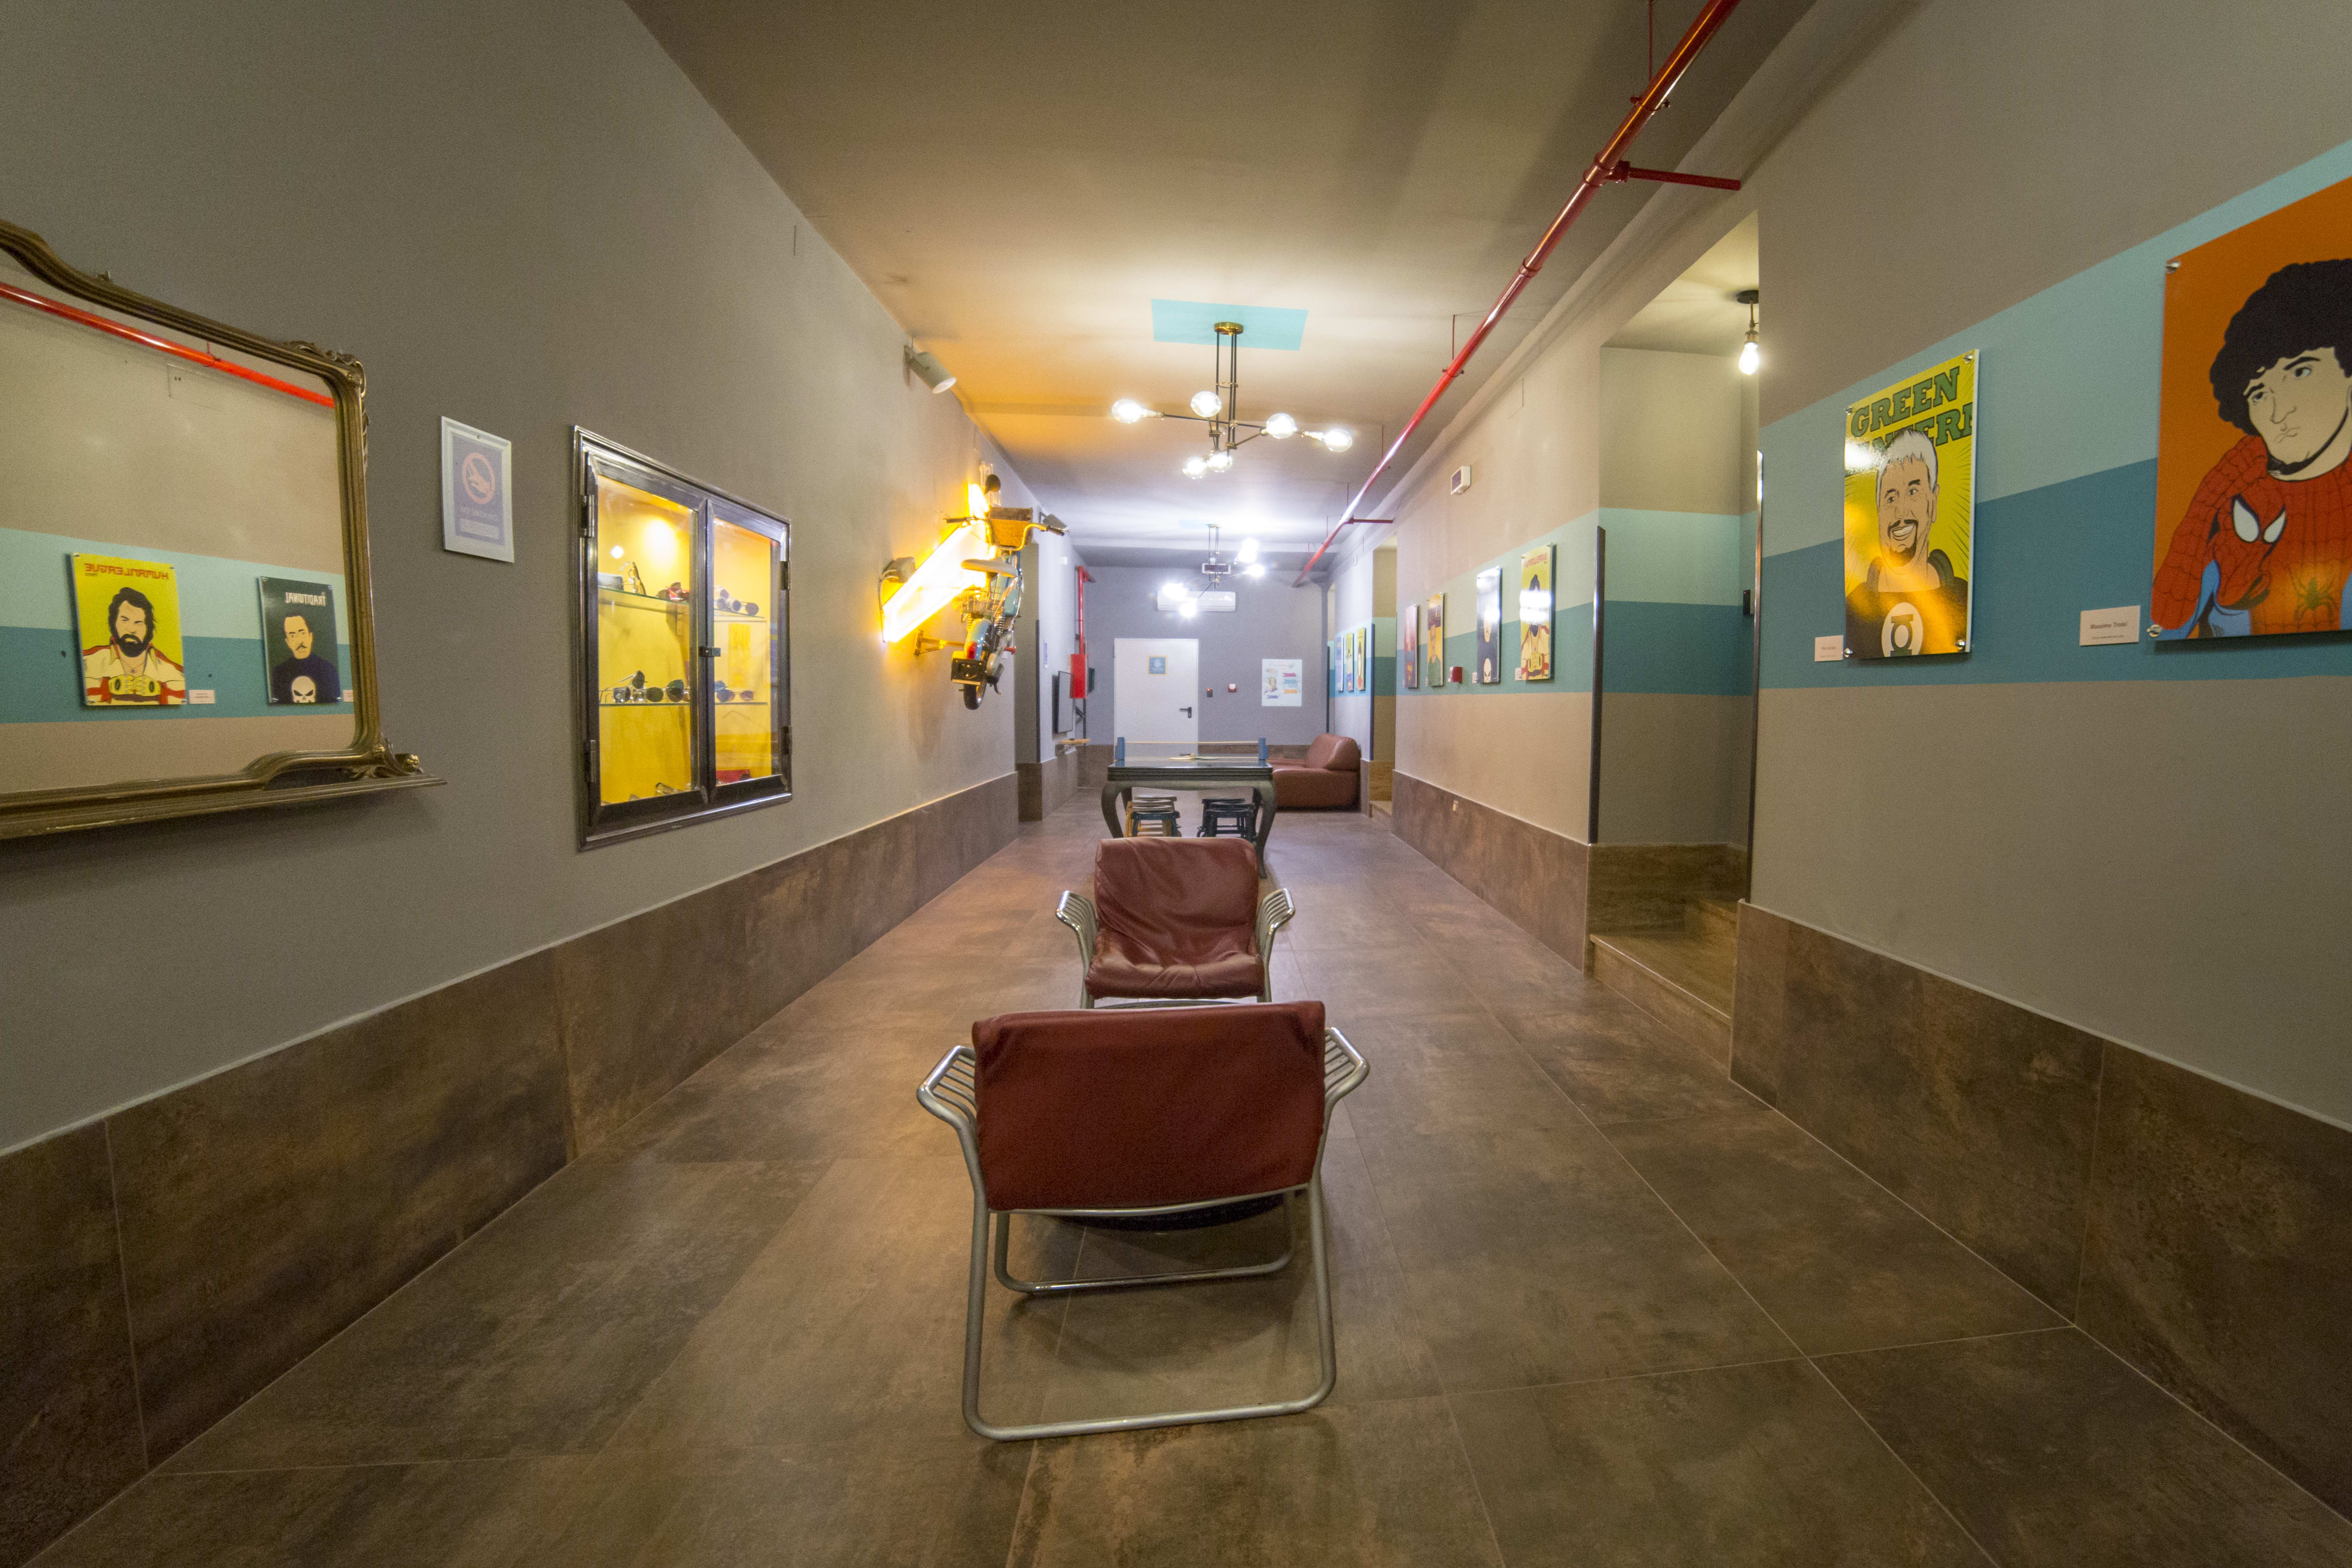 HOSTEL - NeapolitanTrips Hostel